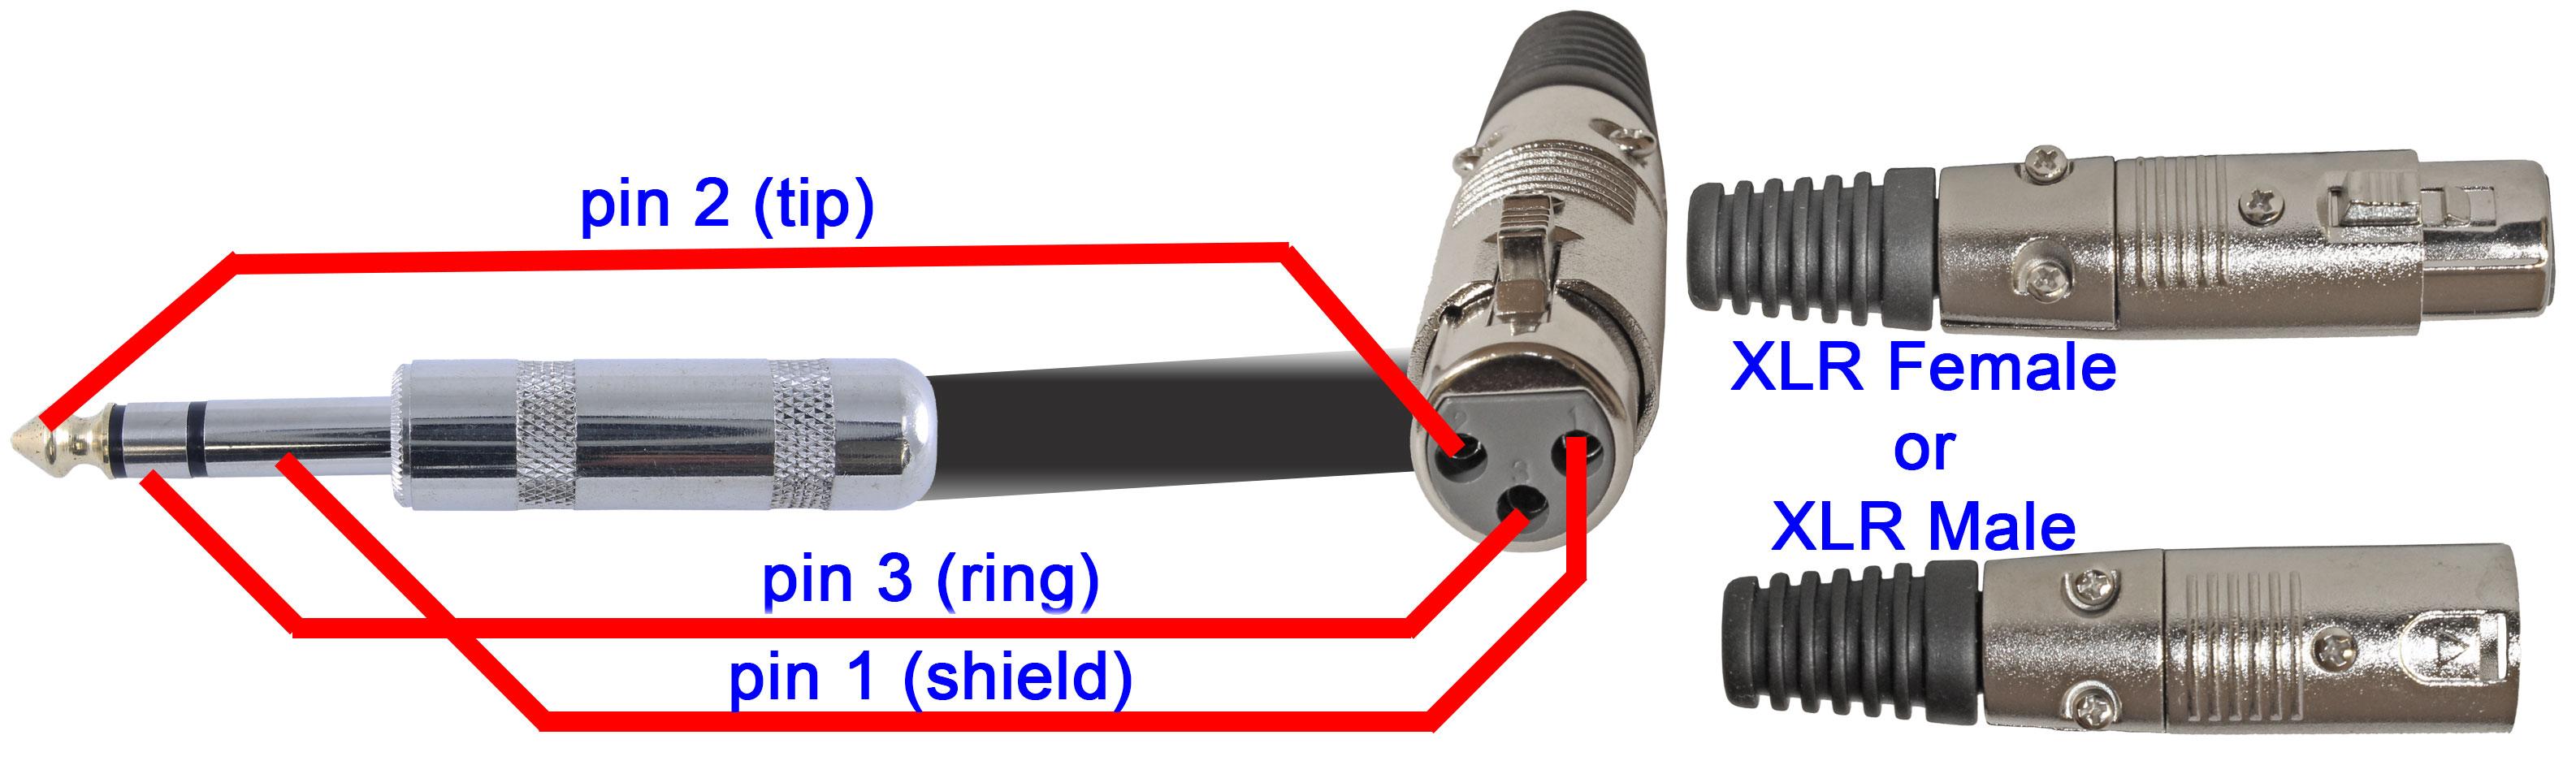 Balanced Input Cable : Balanced vs unbalanced cables faq s advance mcs electronics